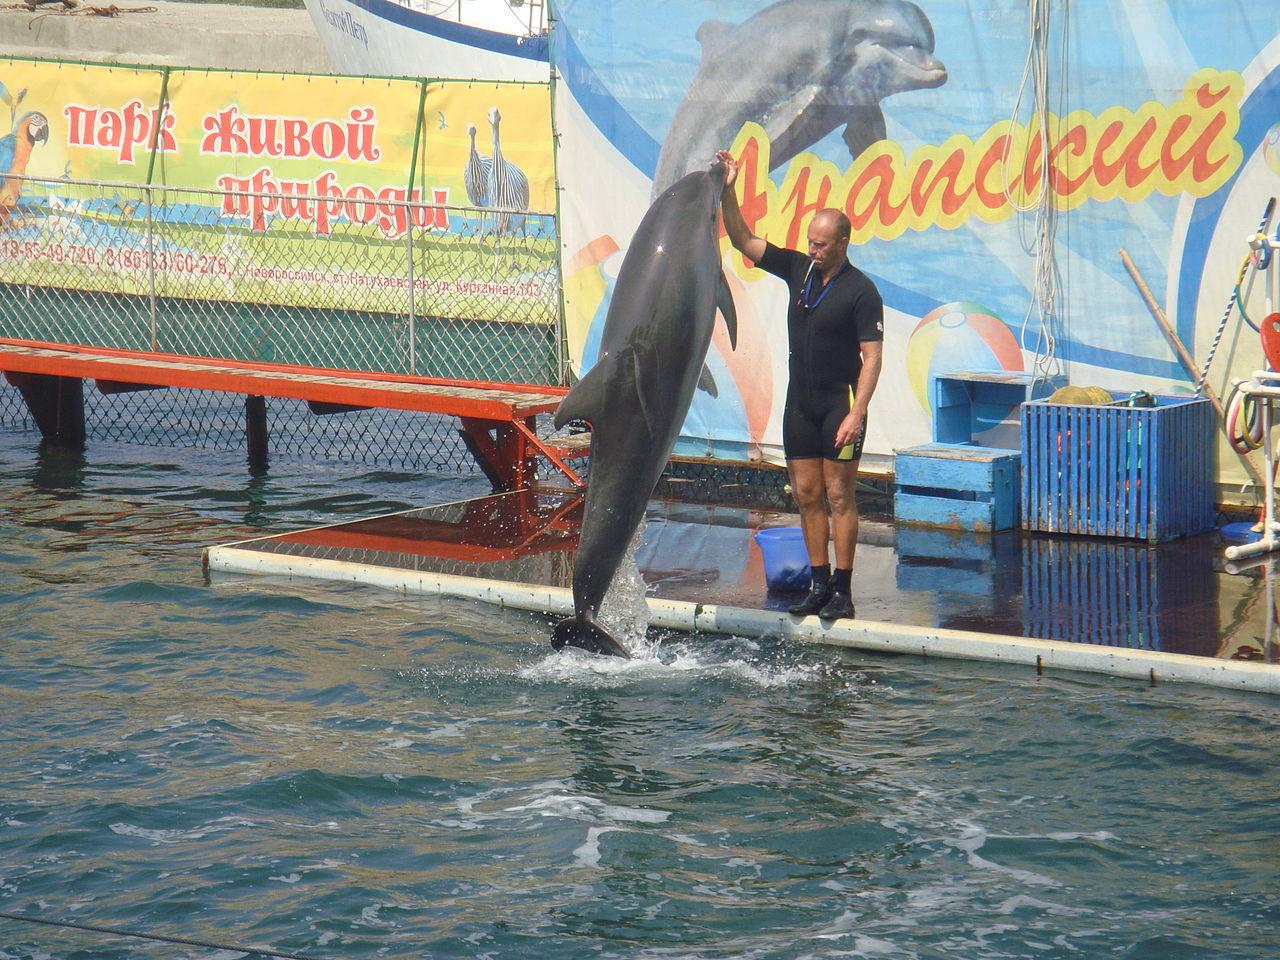 Утришский дельфинарий, Анапа